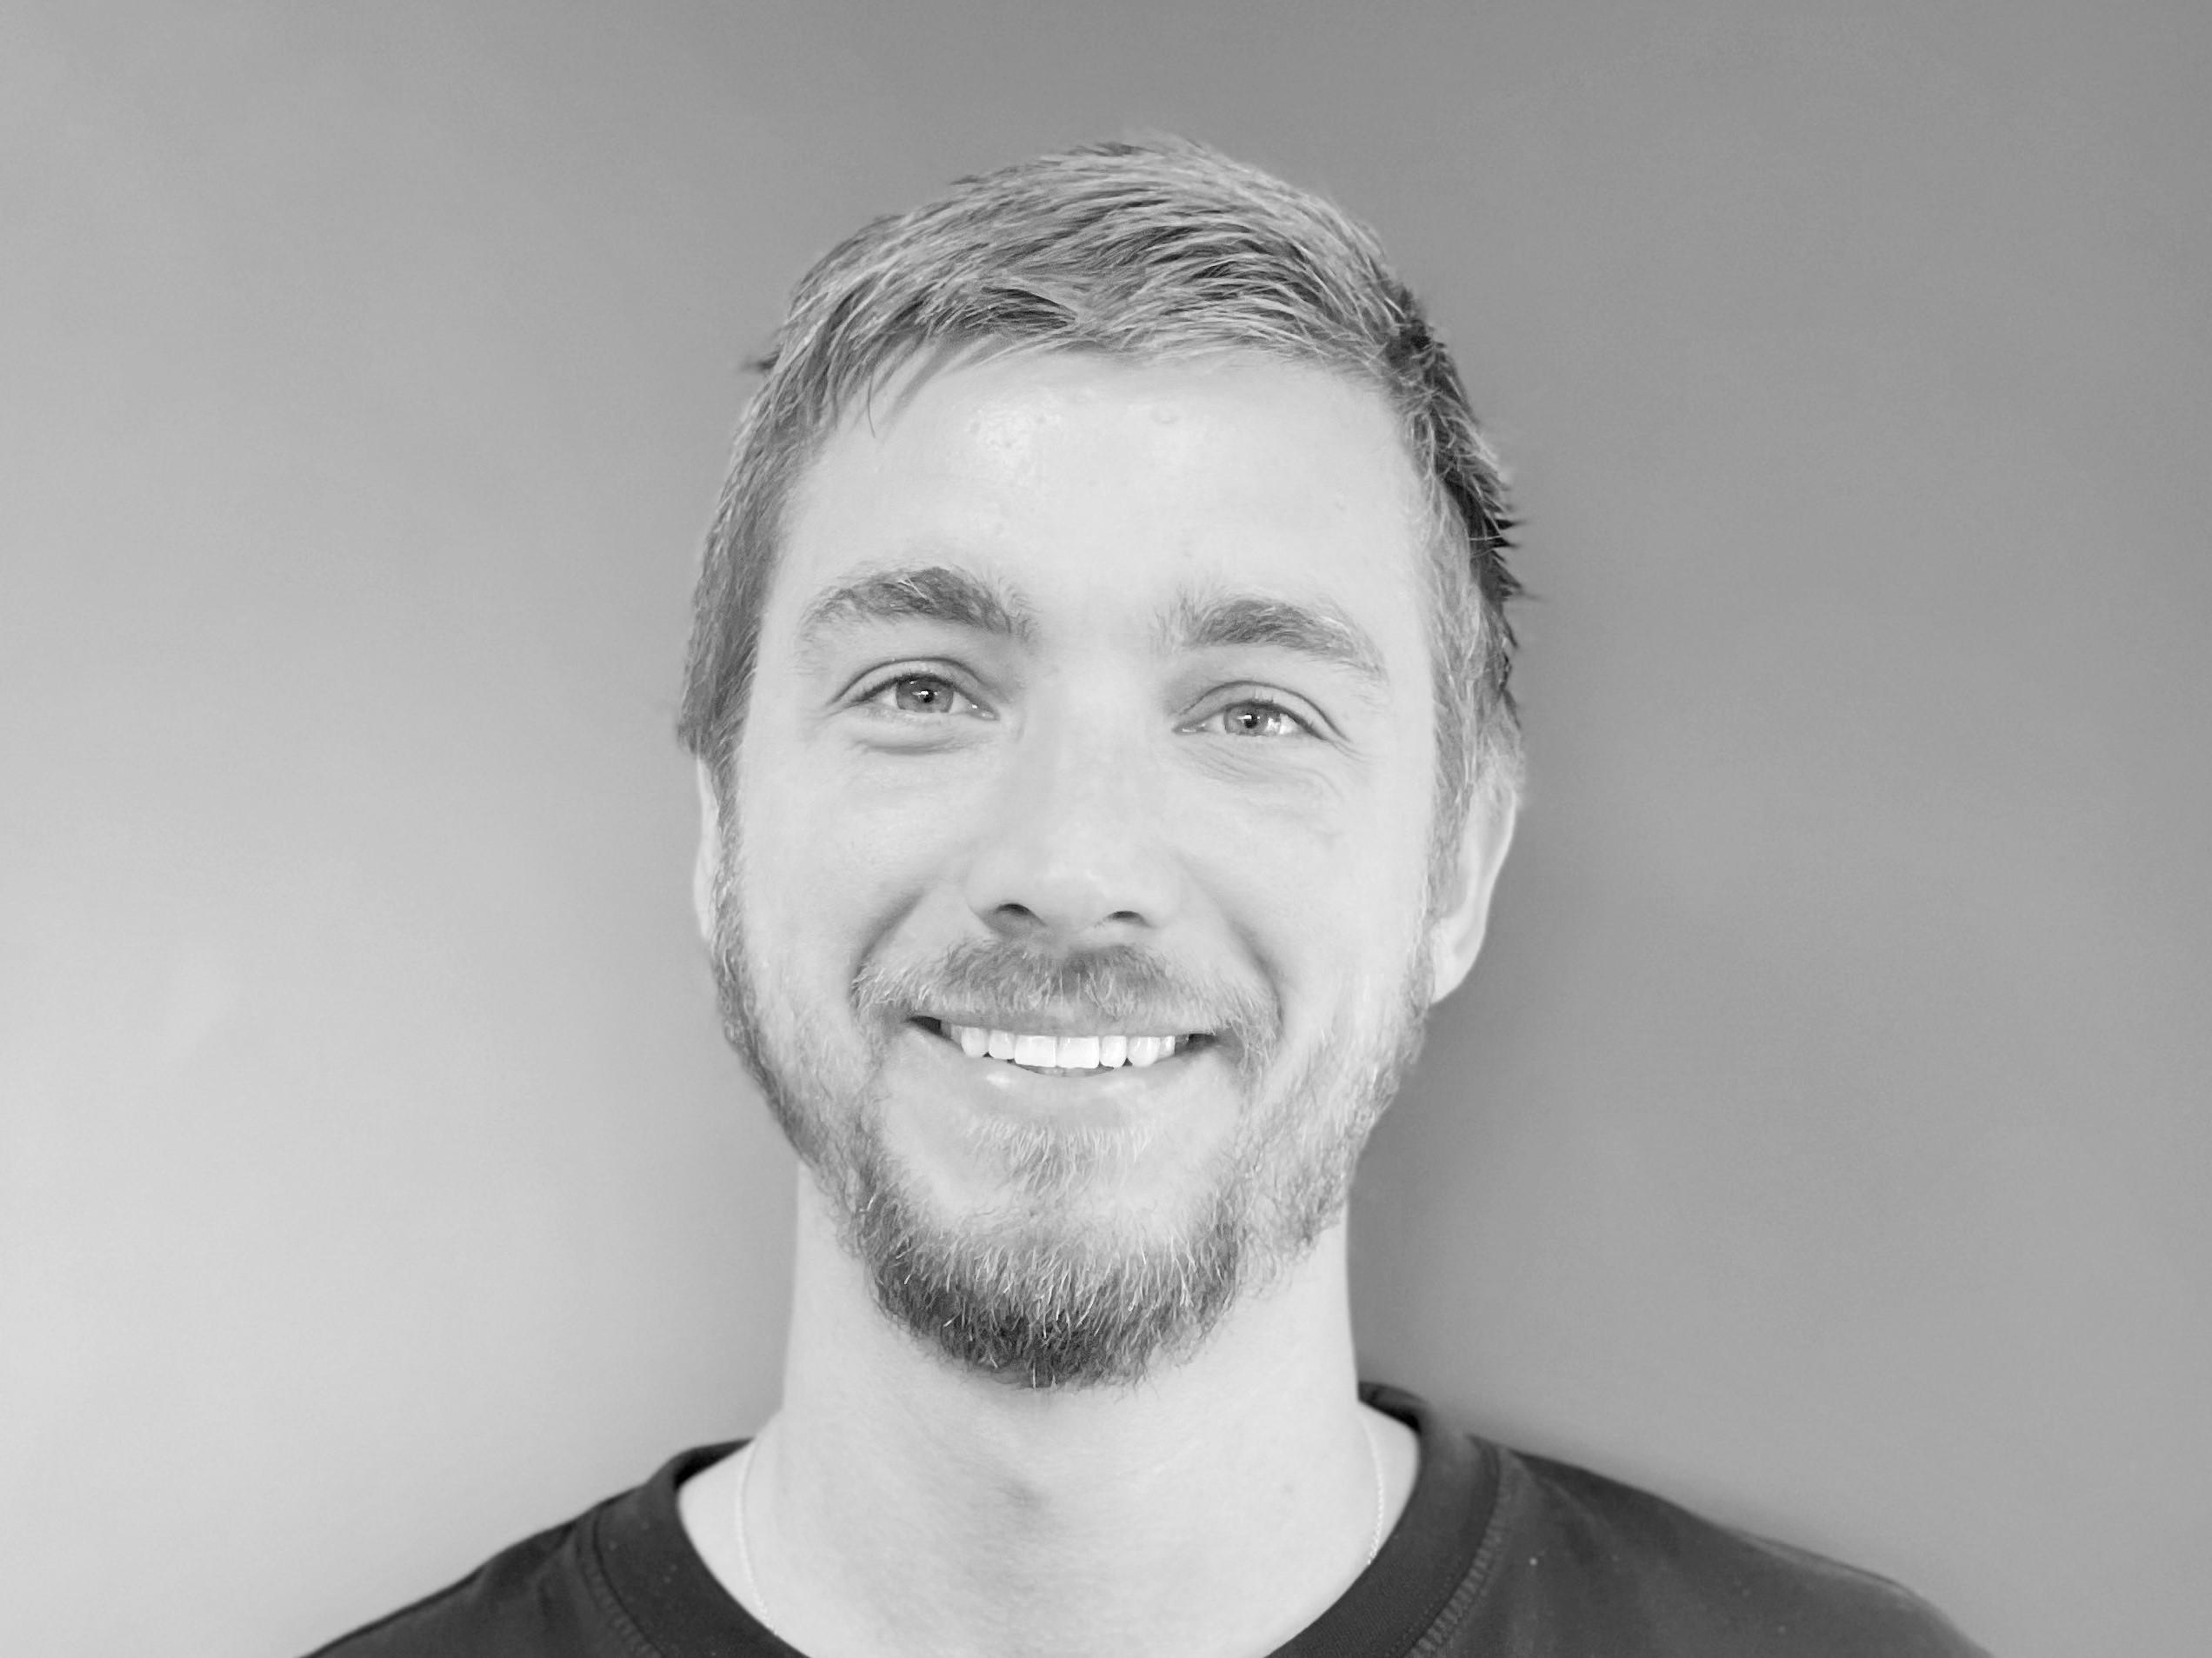 Mathias Almlund